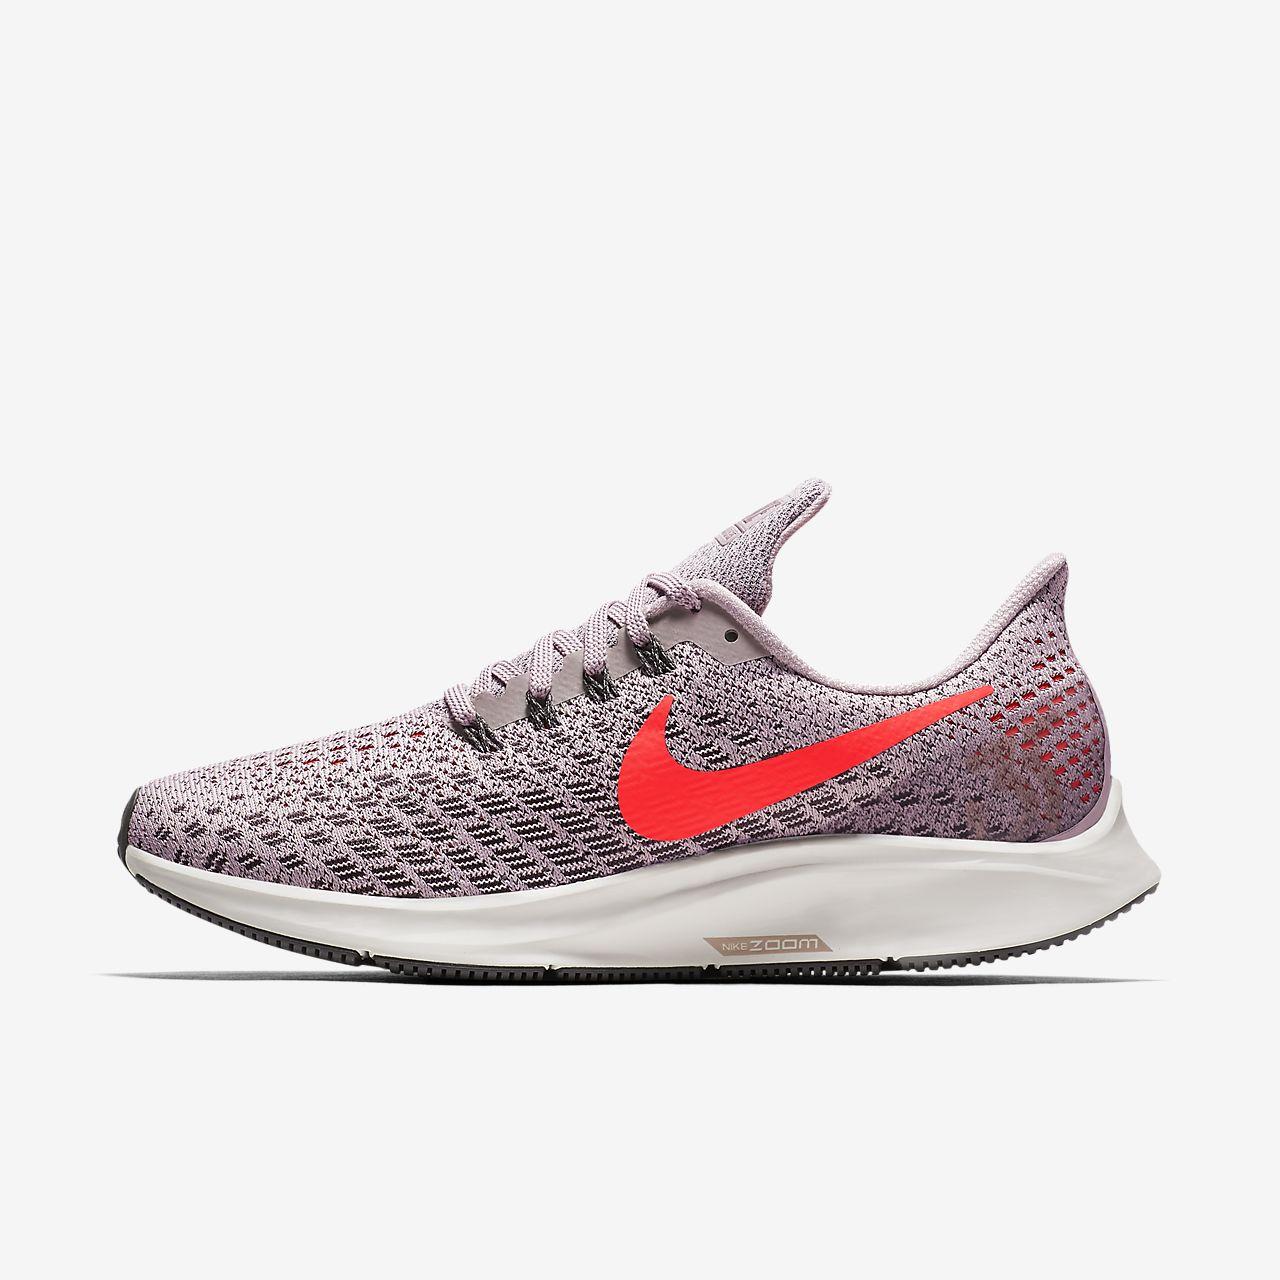 buy online e1a42 664e6 ... Nike Air Zoom Pegasus 35 Damen-Laufschuh